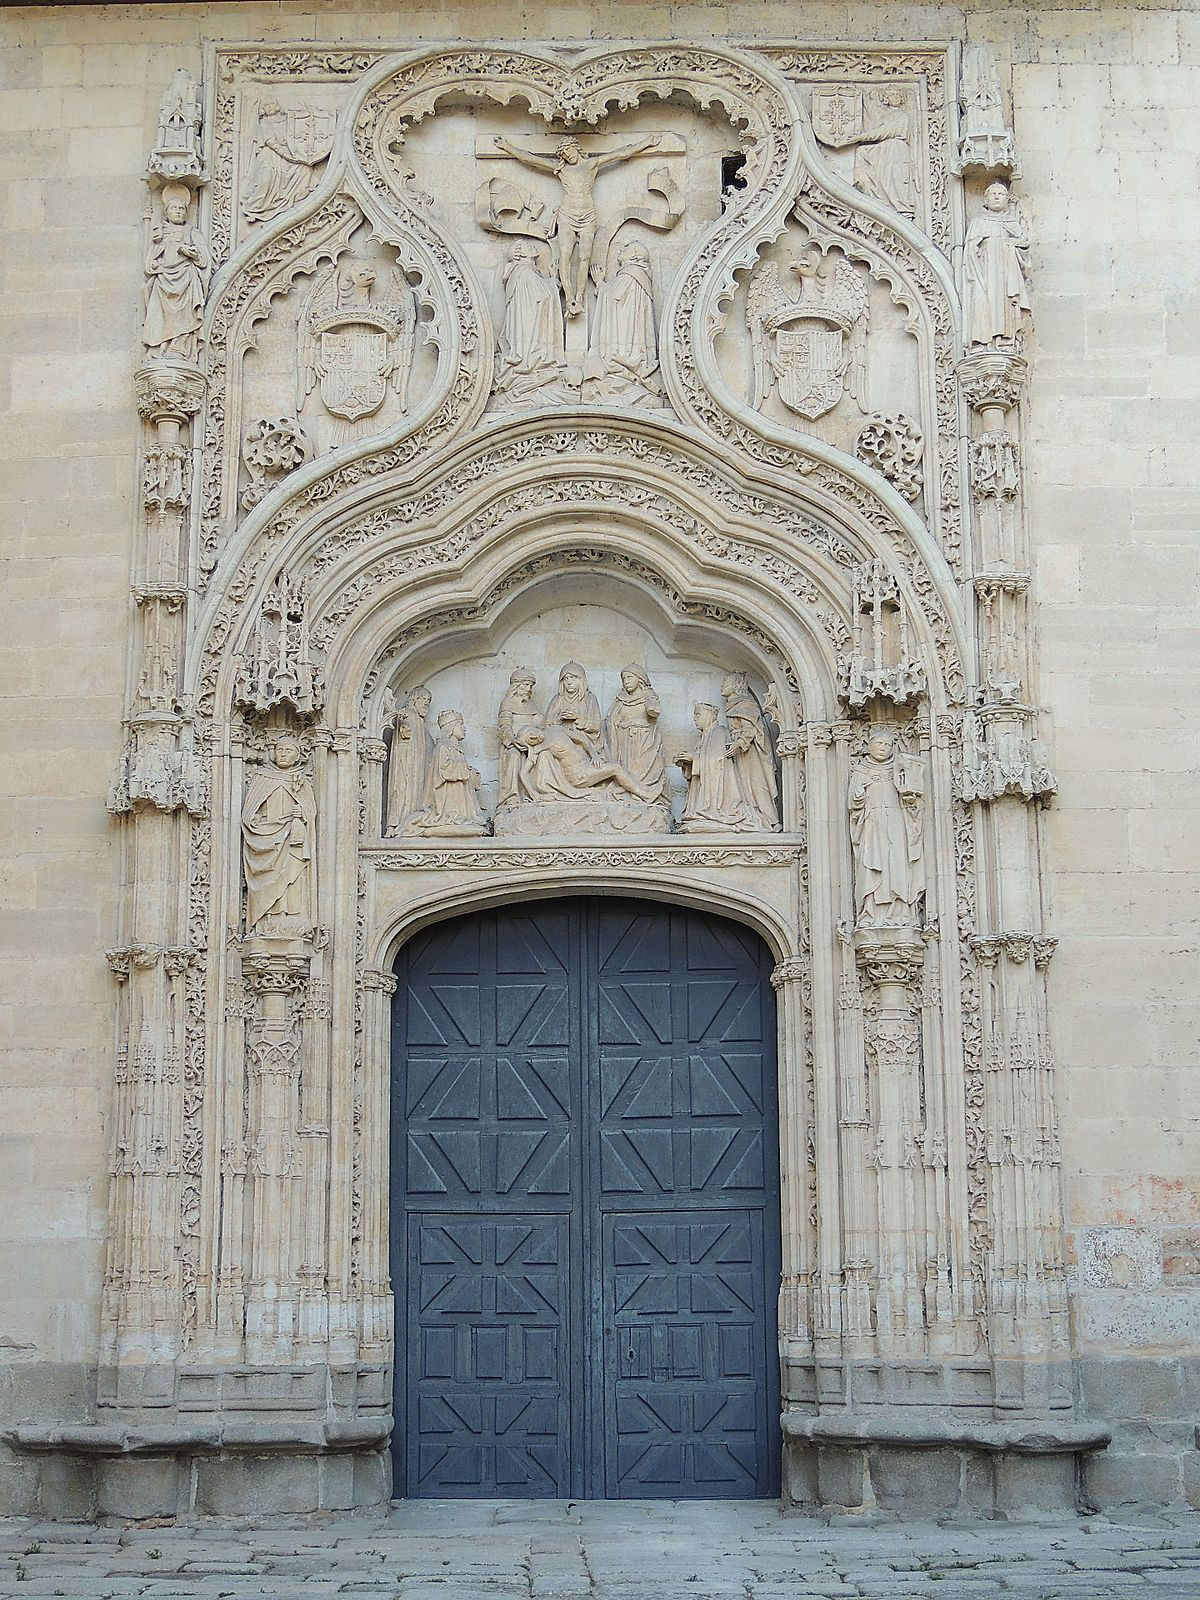 Convento de santa cruz la real wikipedia la for Muebles rey segovia